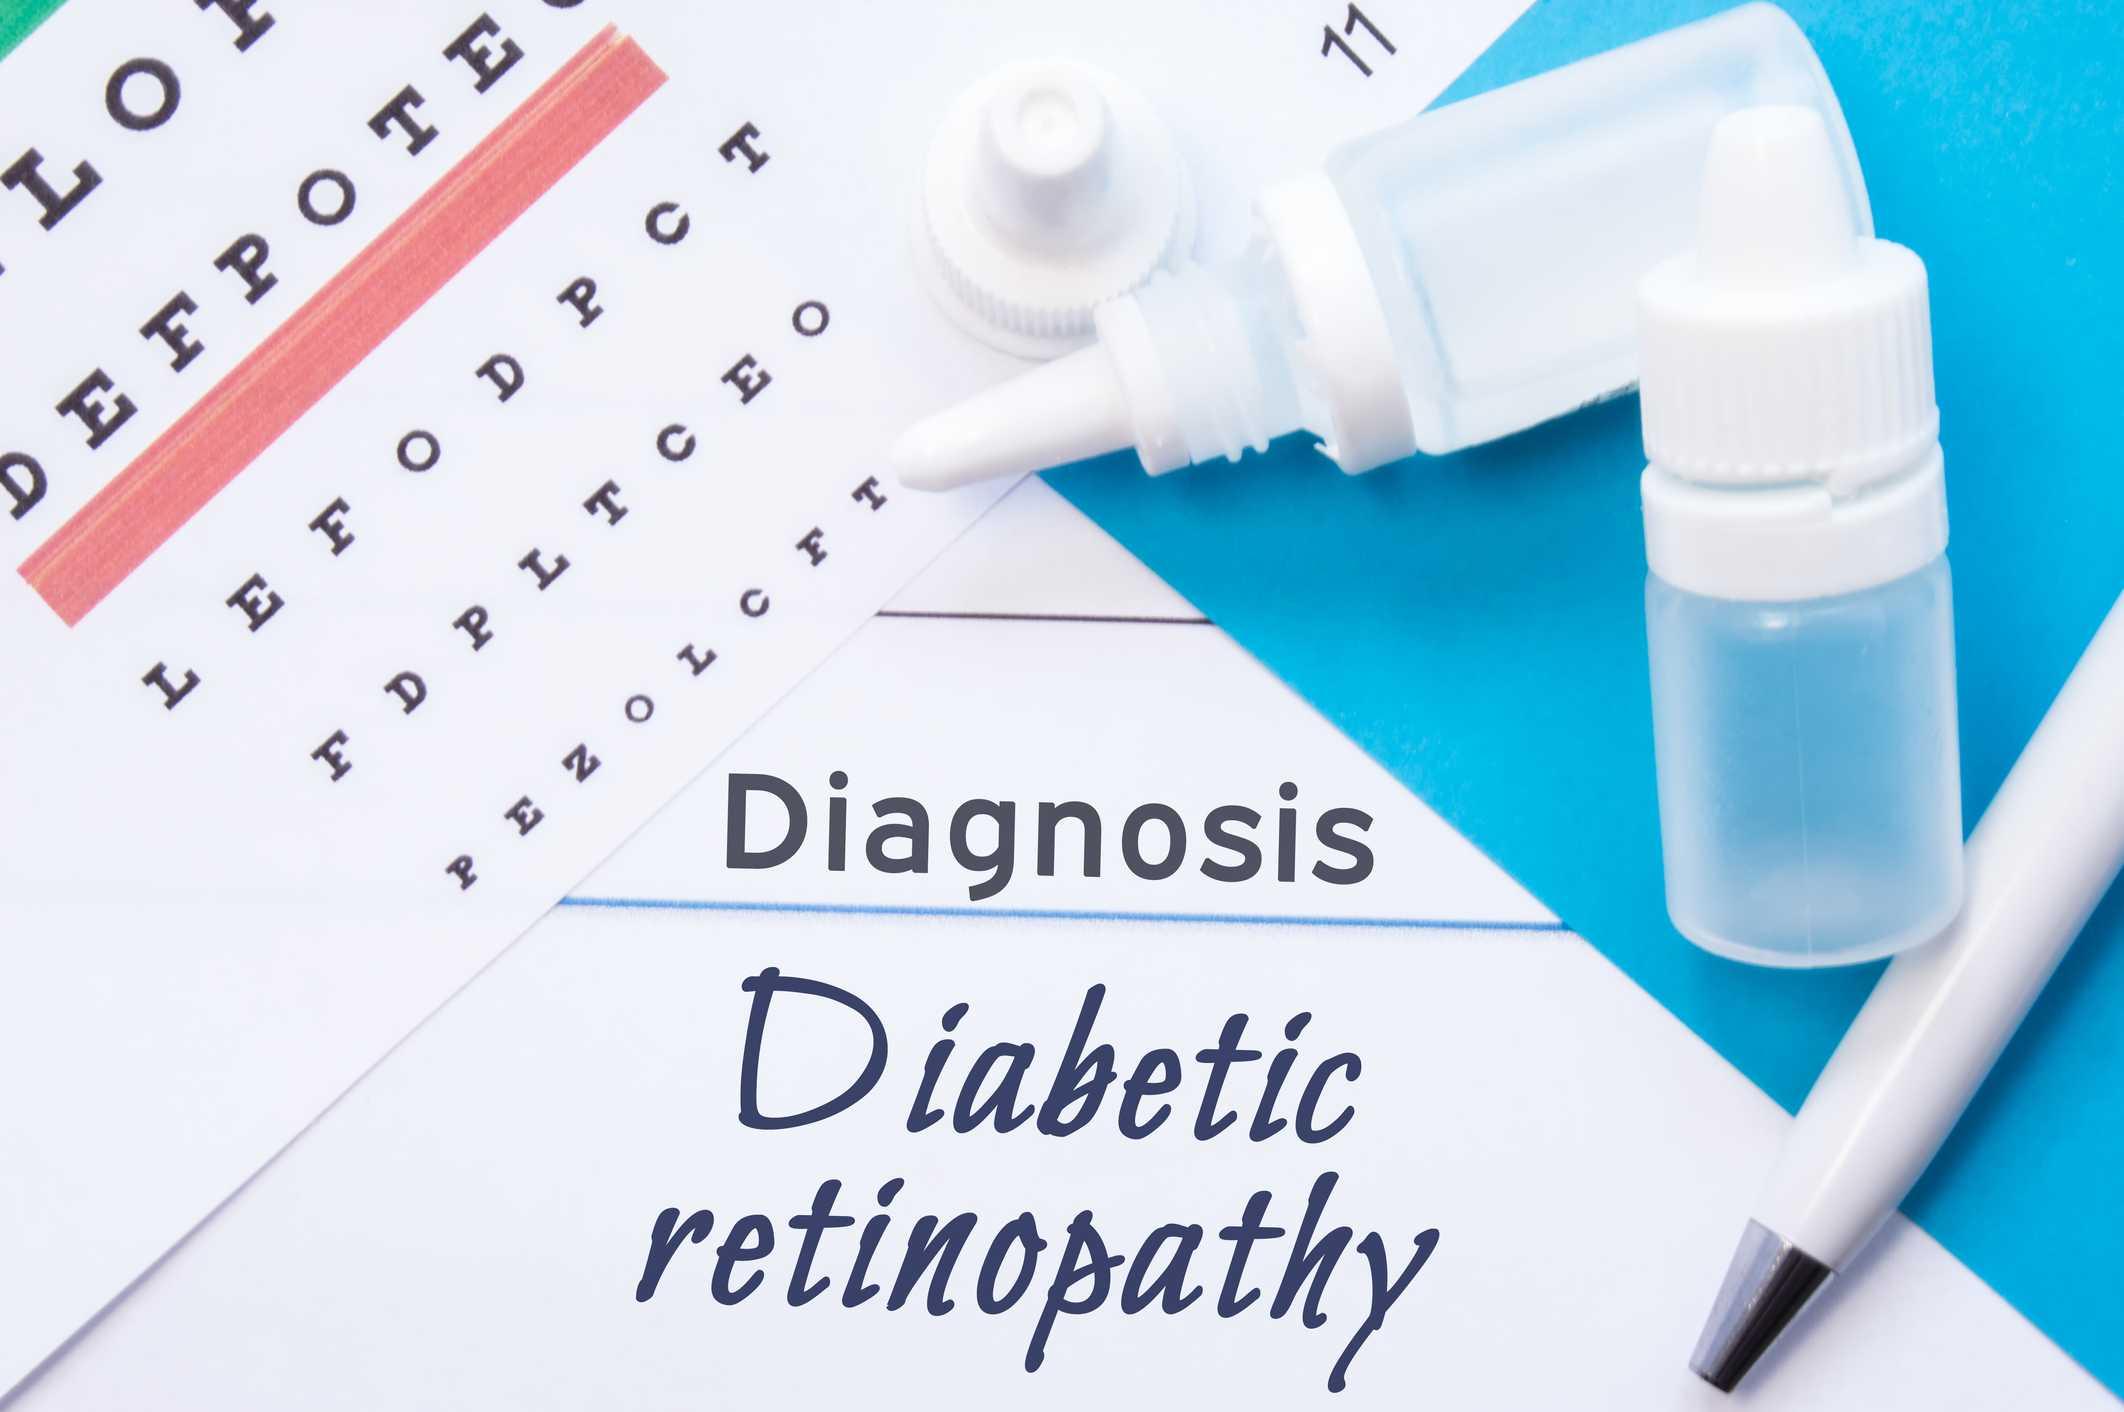 Diabetic Retinopathy Treatment